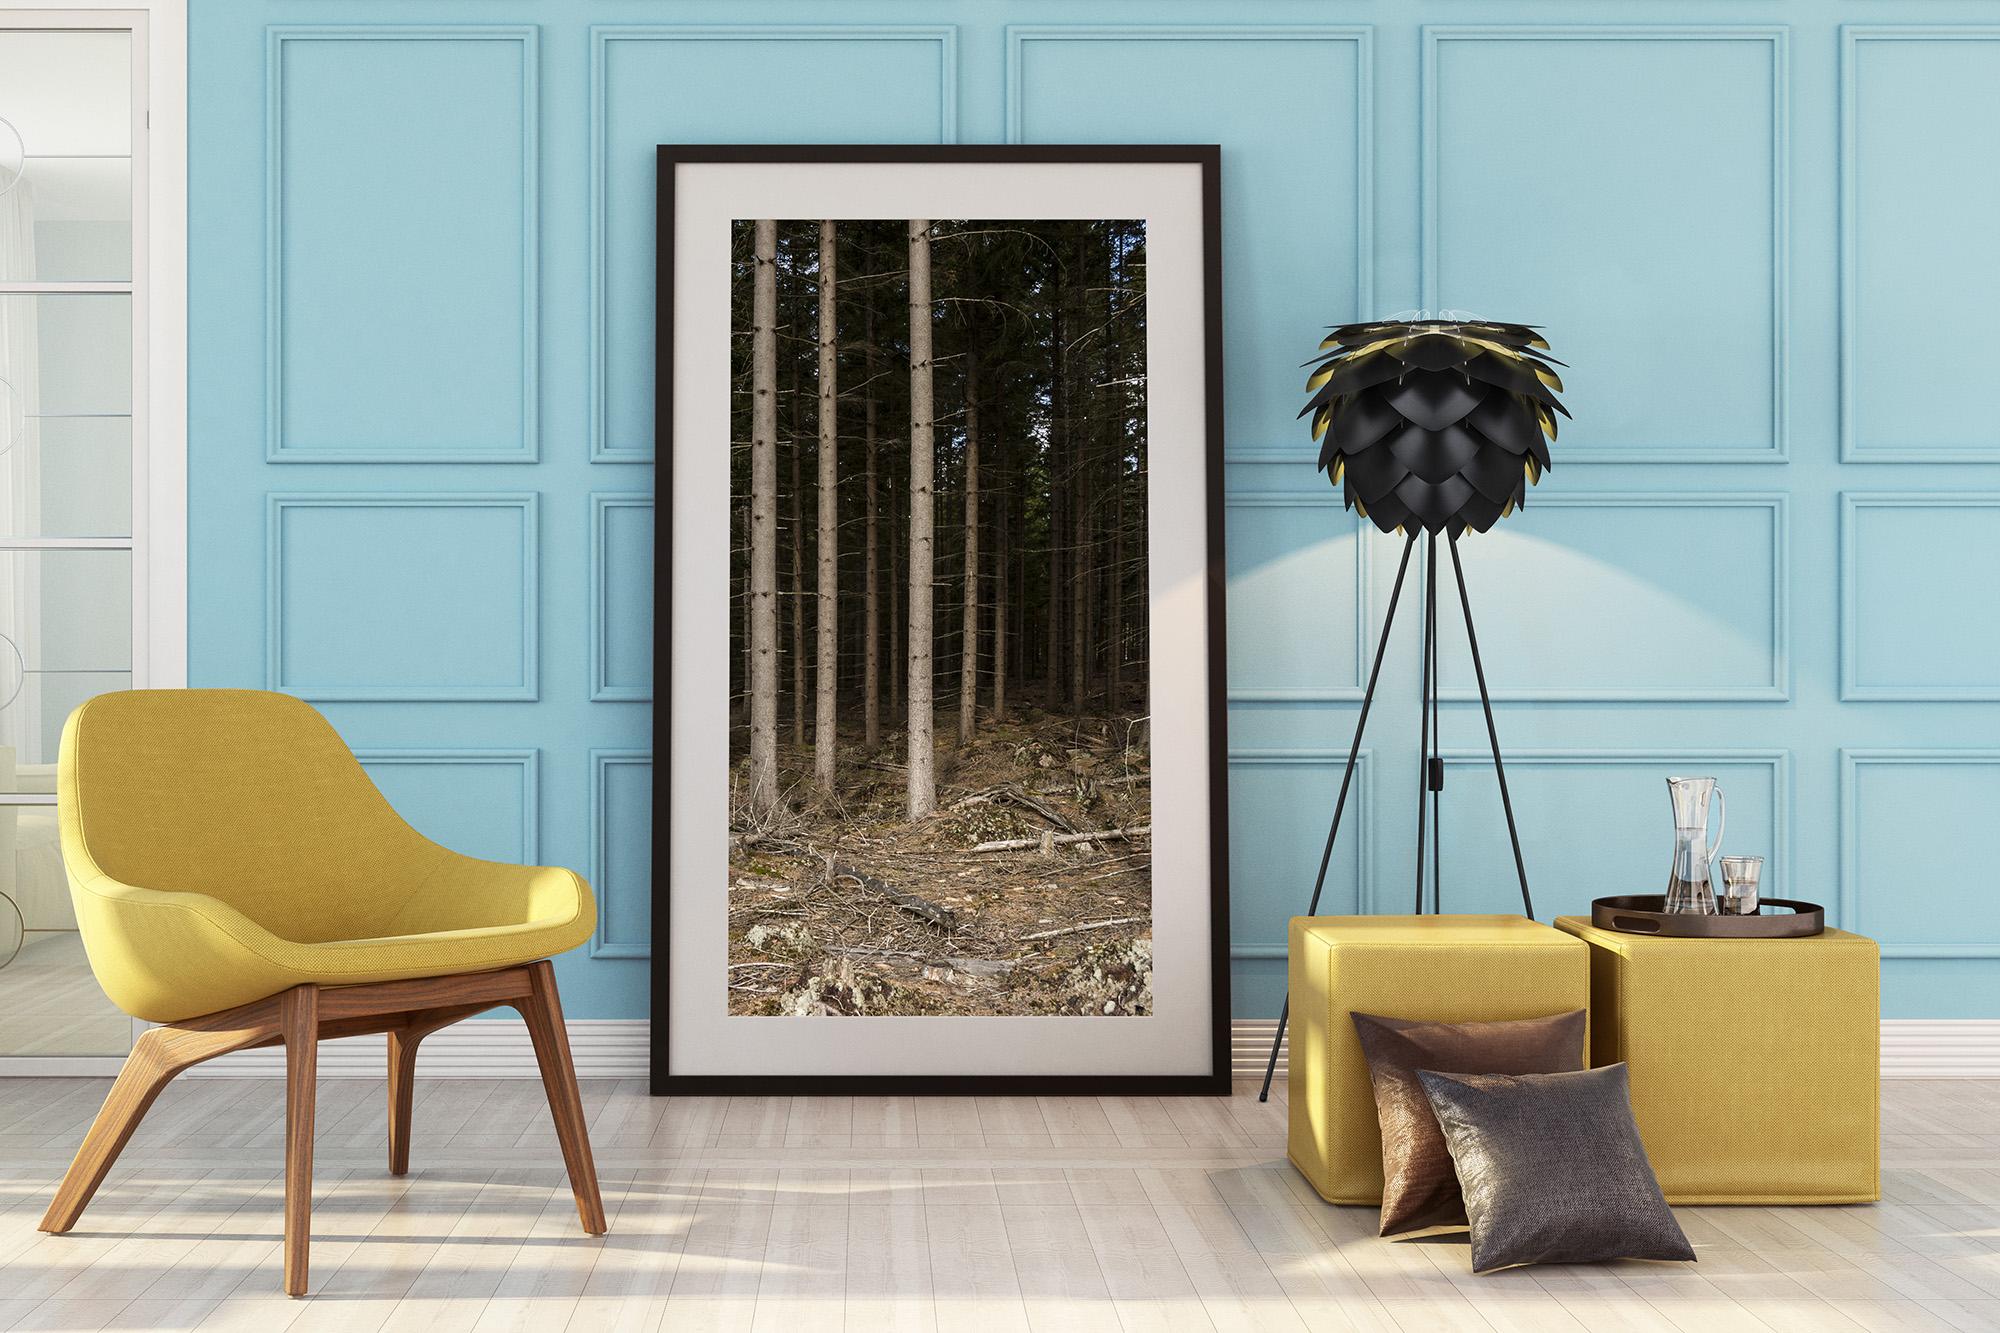 02015_Silvia_black_and_gold_blue_wall_environment_72dpi_sRGB